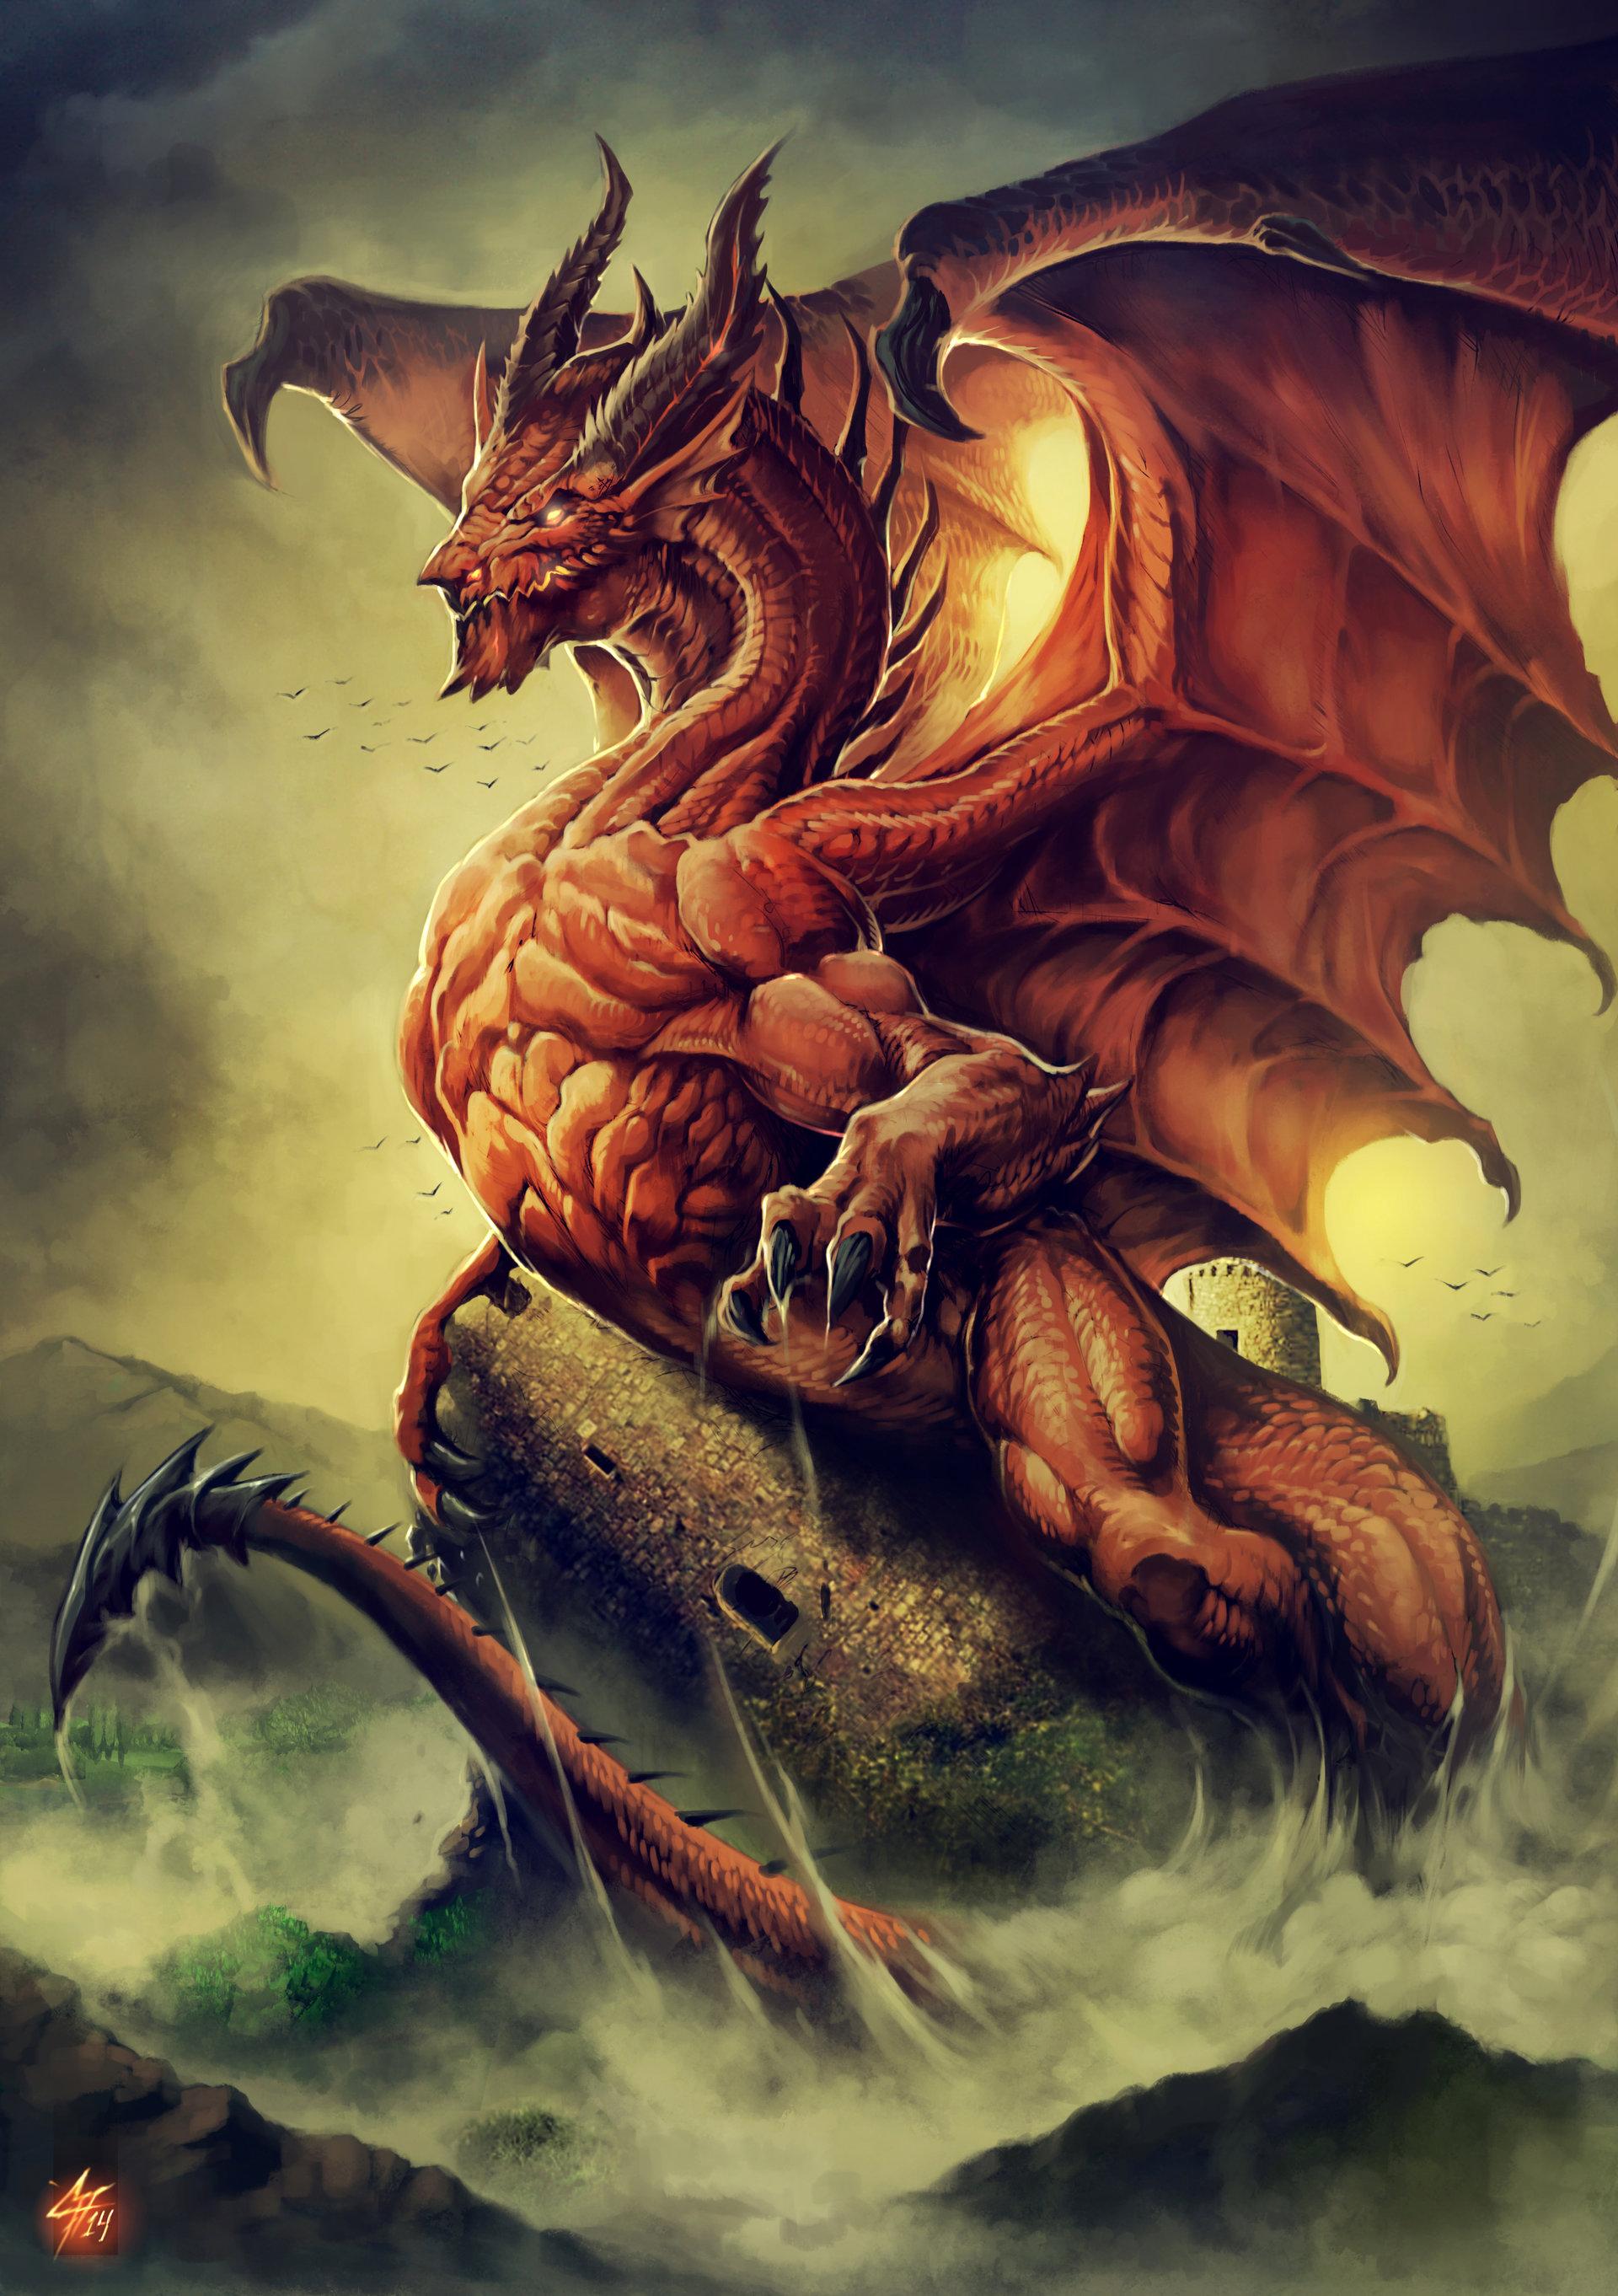 Artstation - Welsh Dragon Carlos Herrera